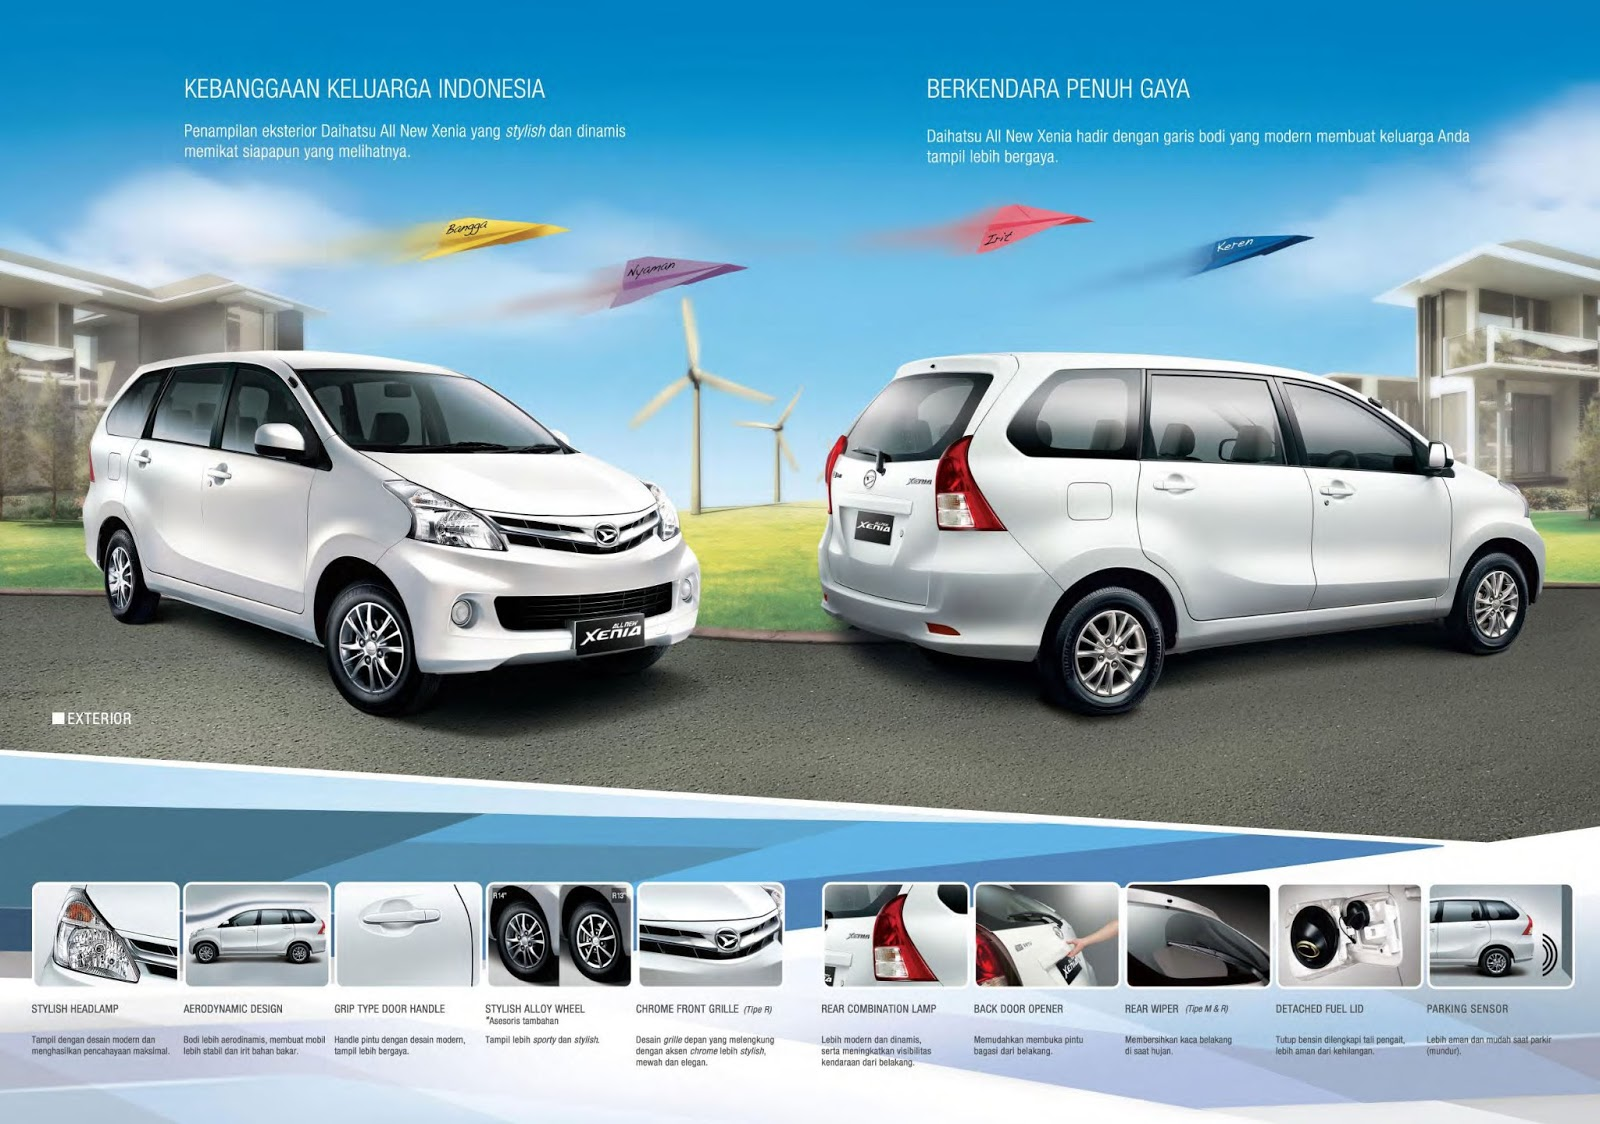 Kelebihan Harga Toyota Innova 2019 Murah Berkualitas